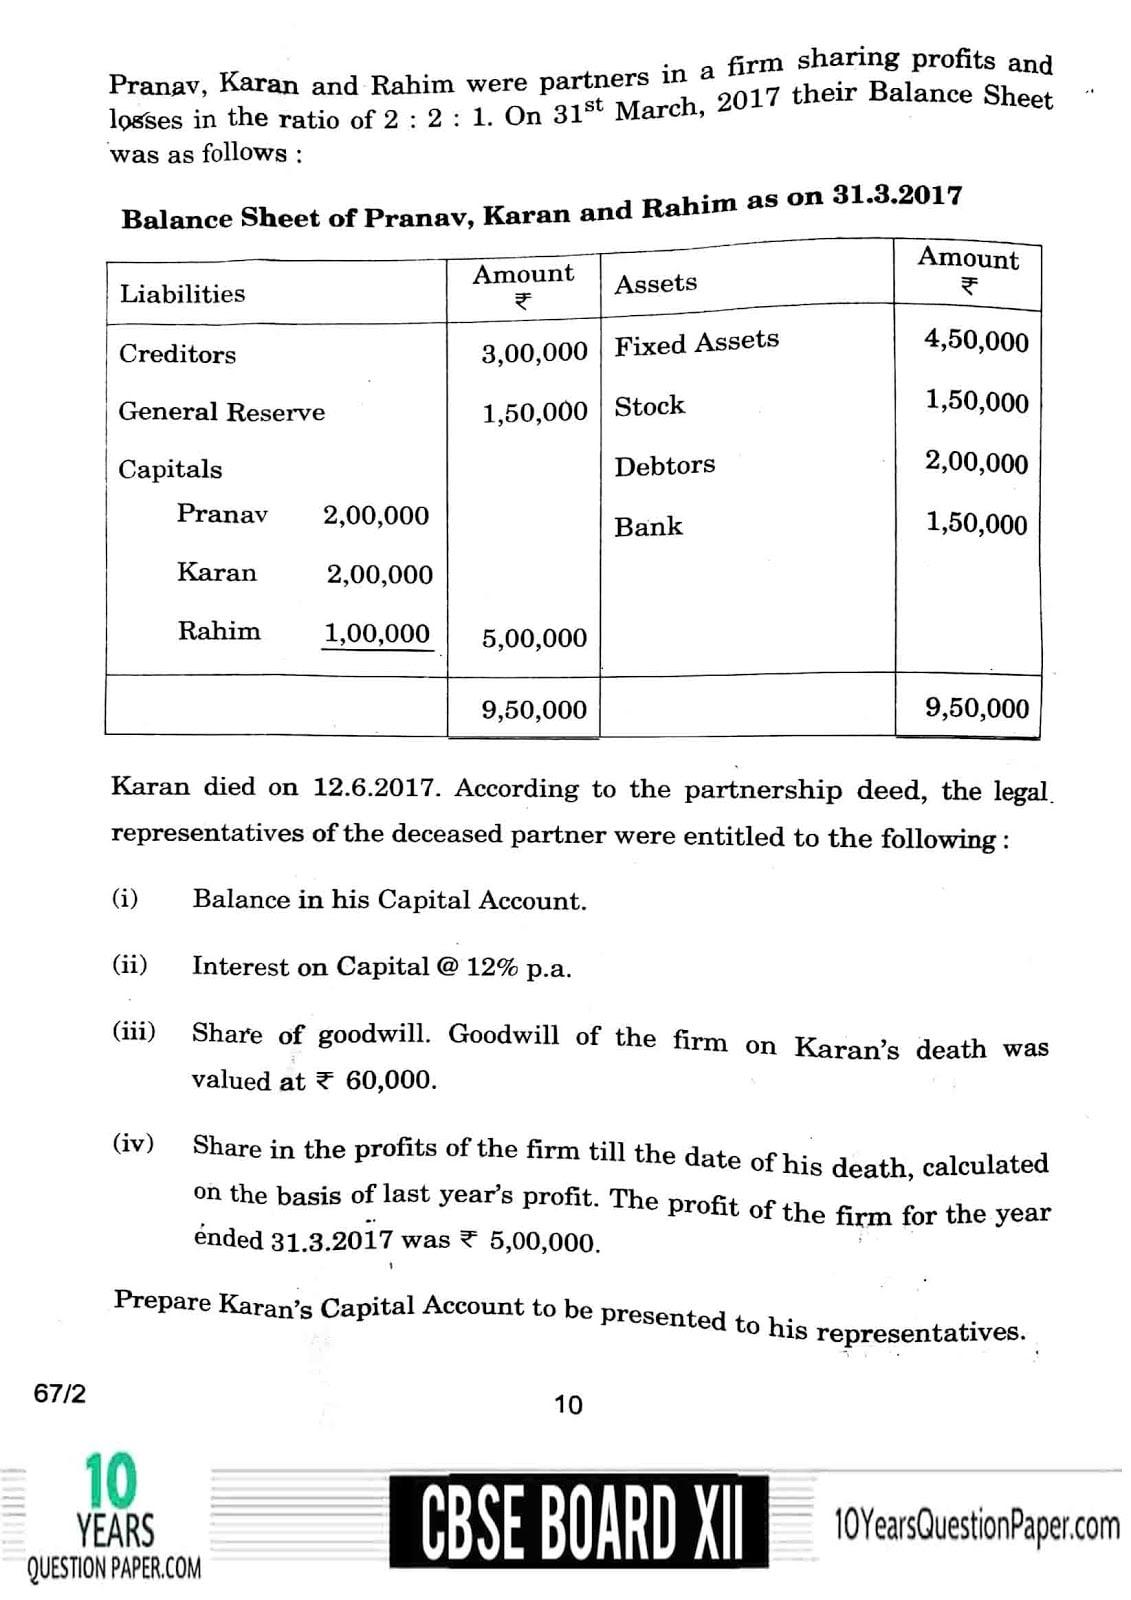 CBSE Class 12 Accountancy 2018 Question Paper